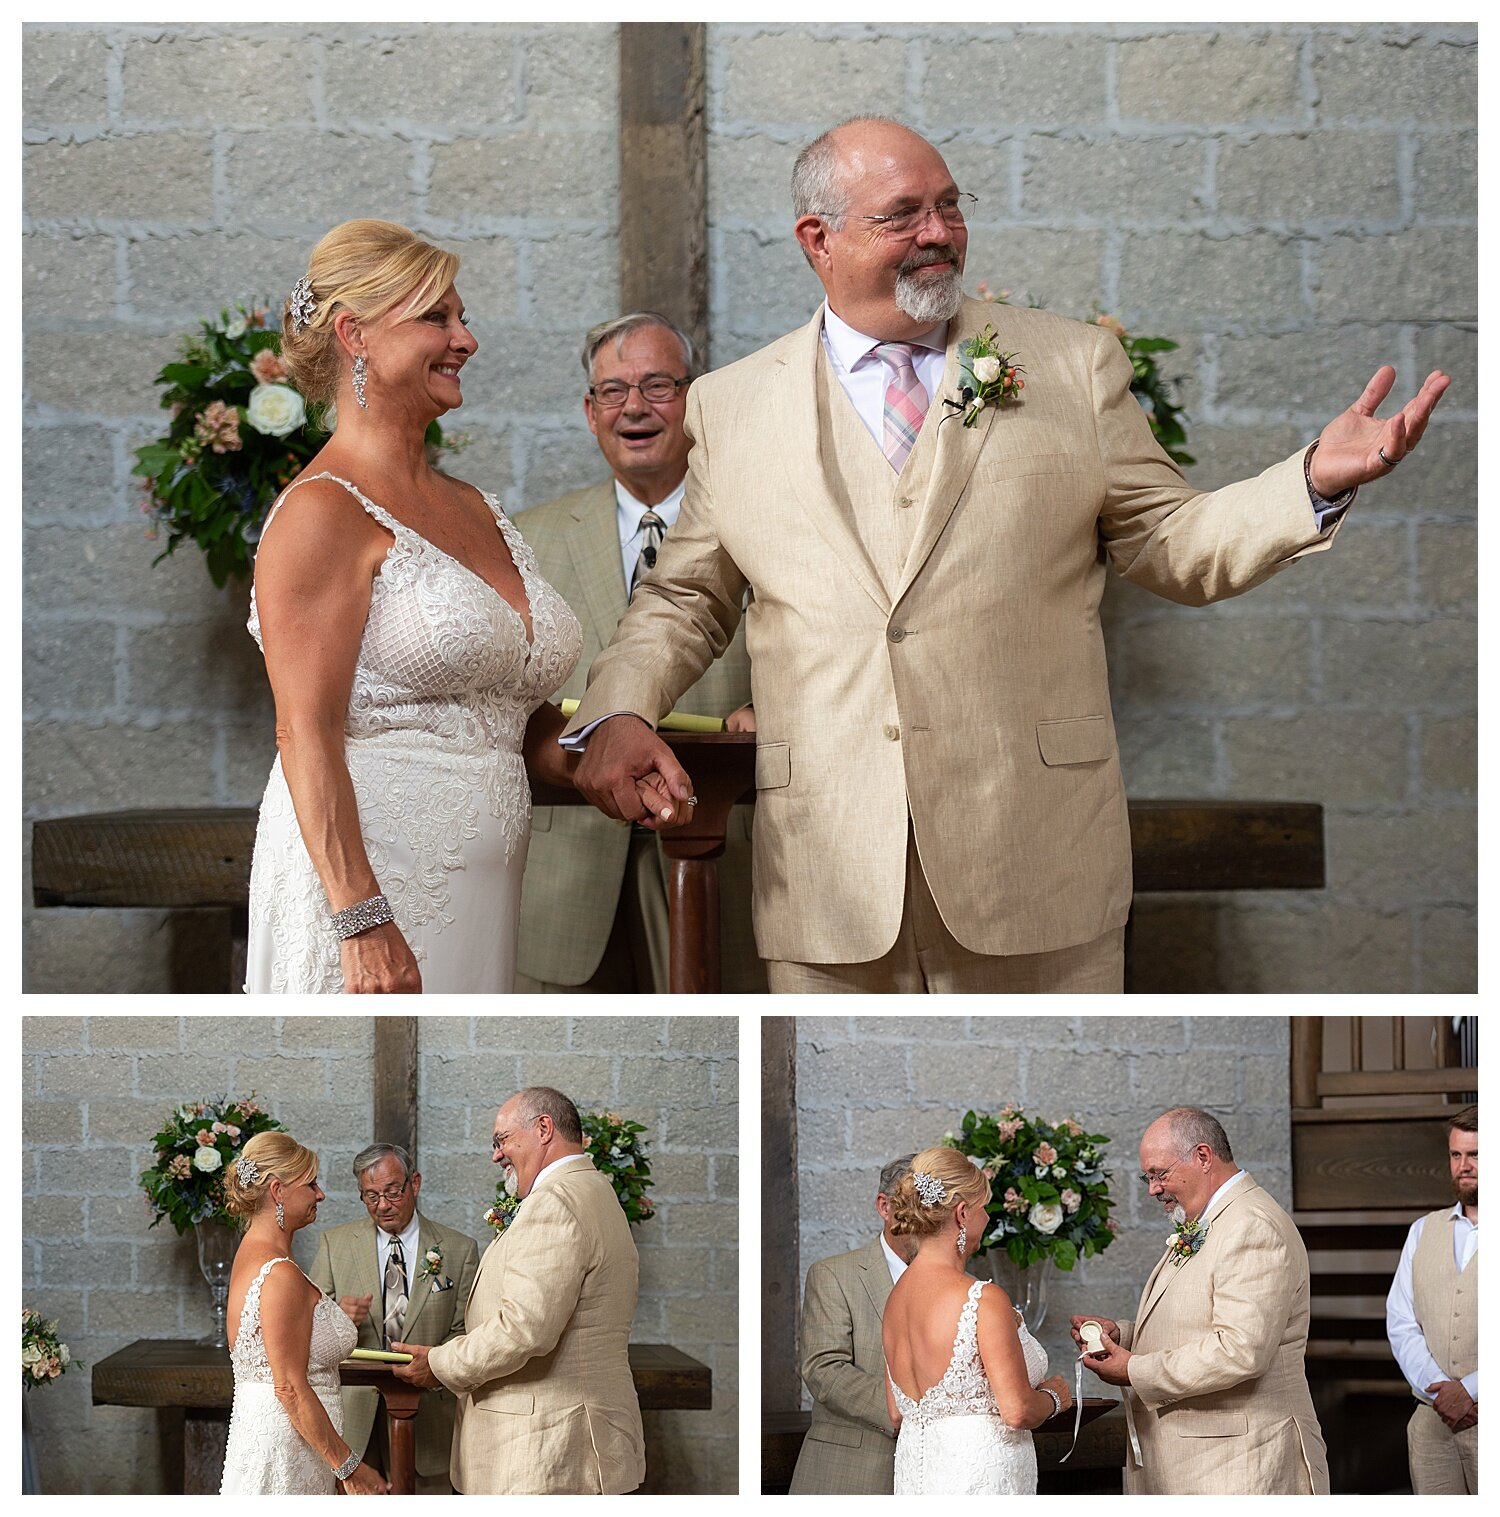 Florida Castle Wedding - St. Augustine 017.JPG